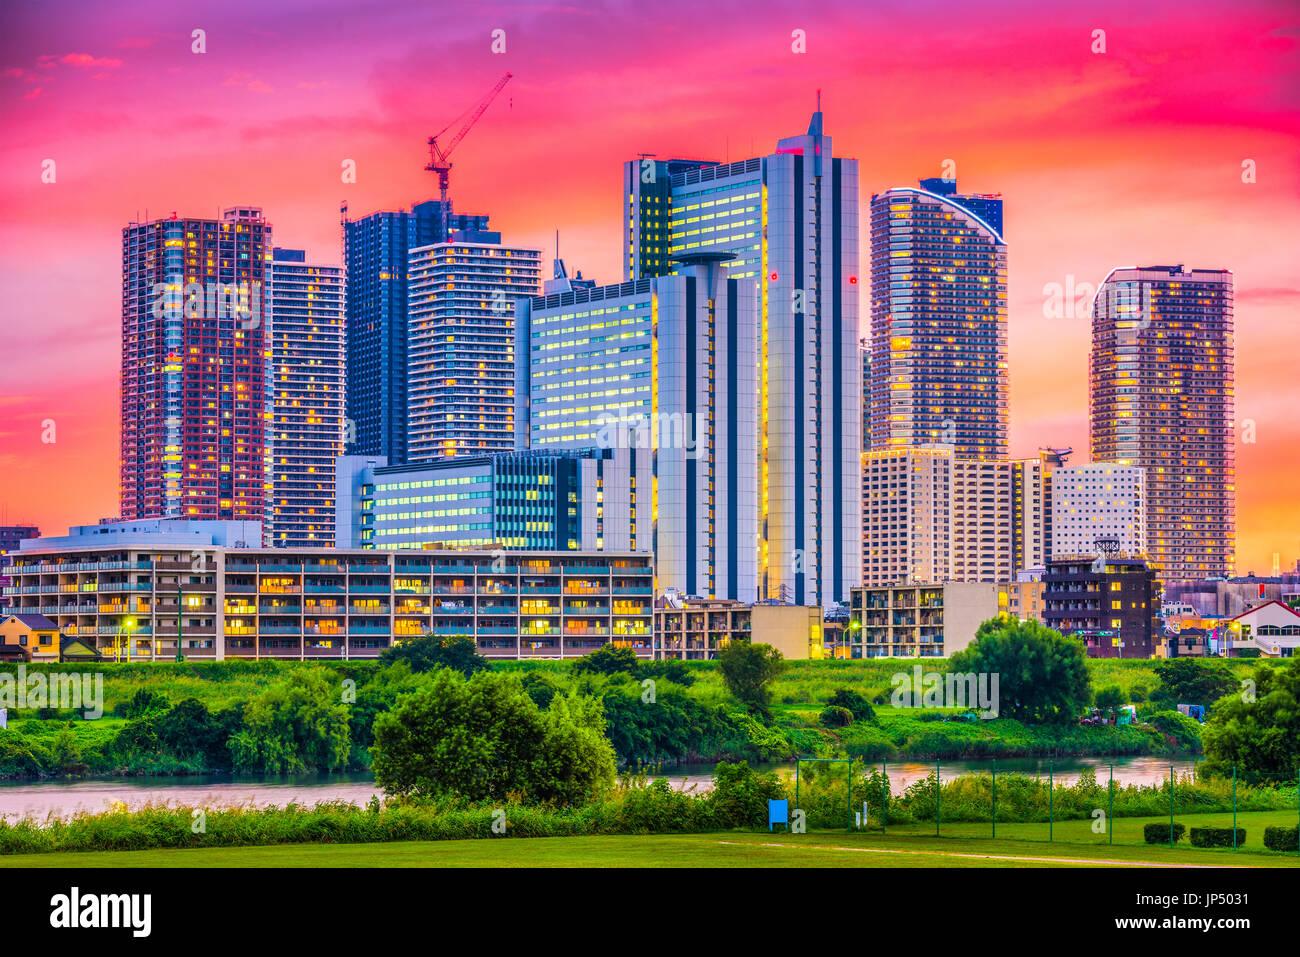 Kawasaki, Japan downtown city skyline. - Stock Image